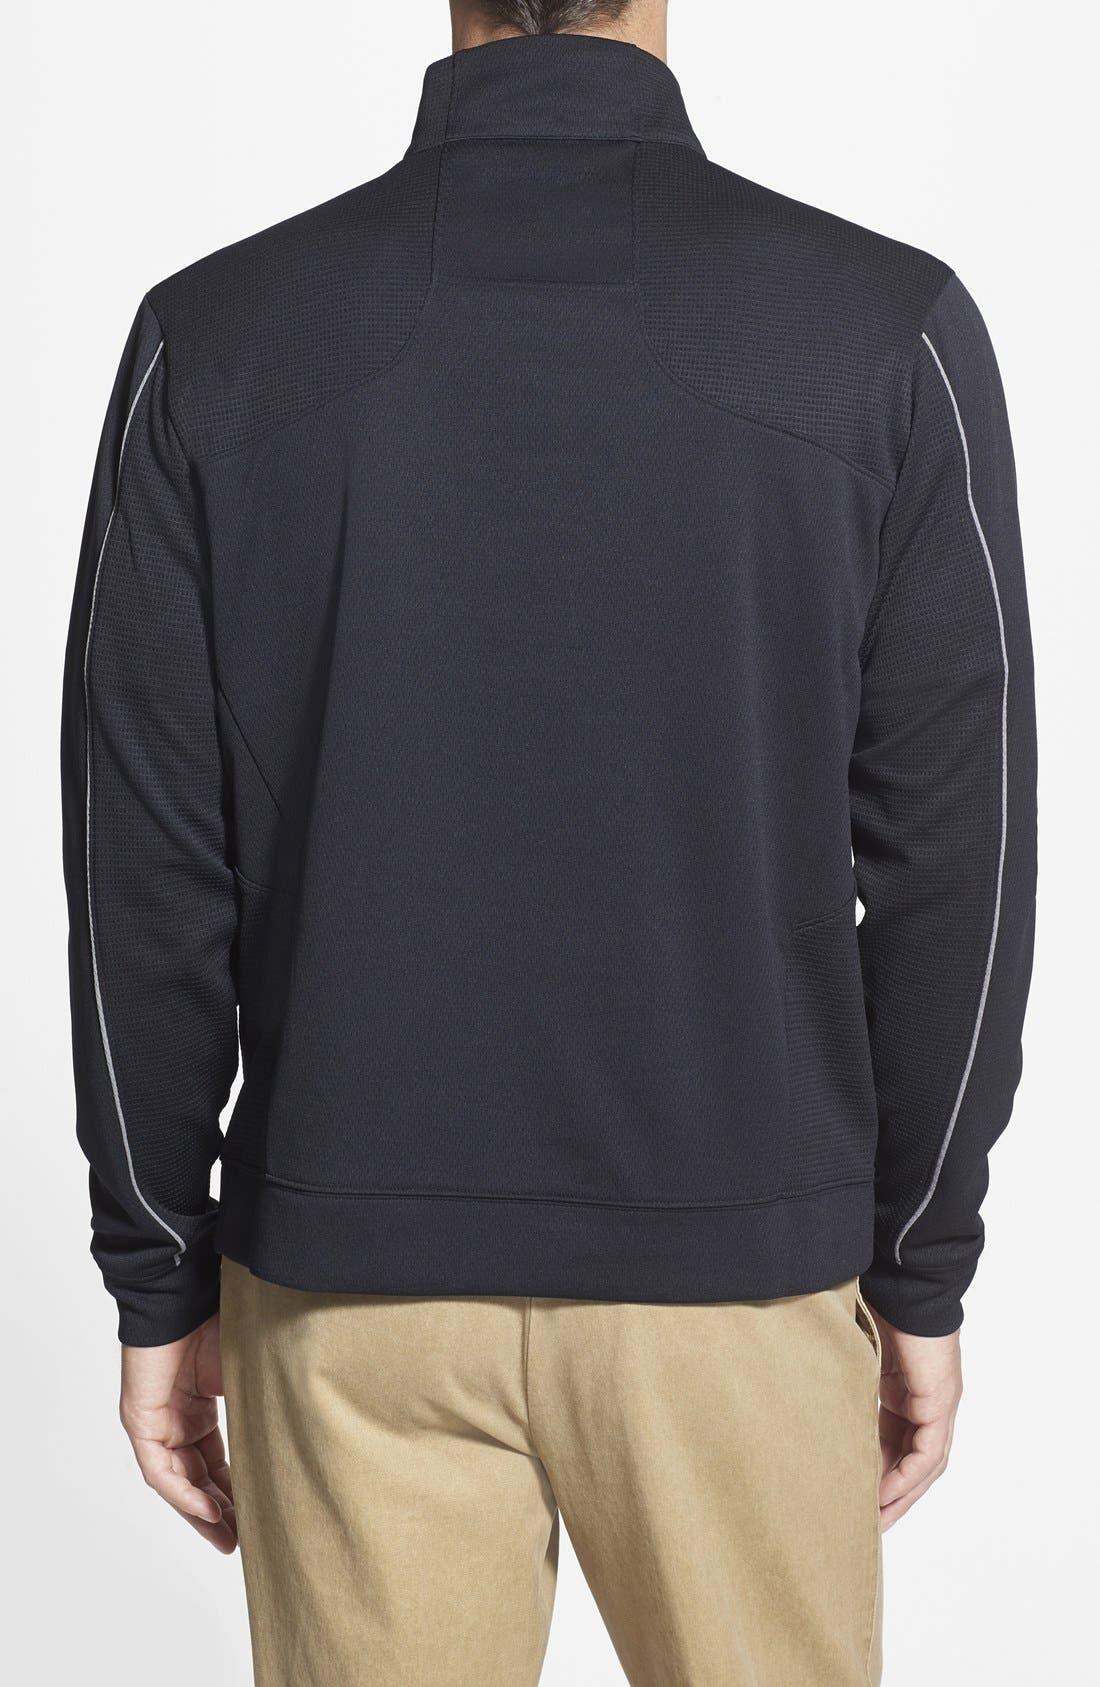 Cincinnati Bengals - Edge DryTec Moisture Wicking Half Zip Pullover,                             Alternate thumbnail 2, color,                             001